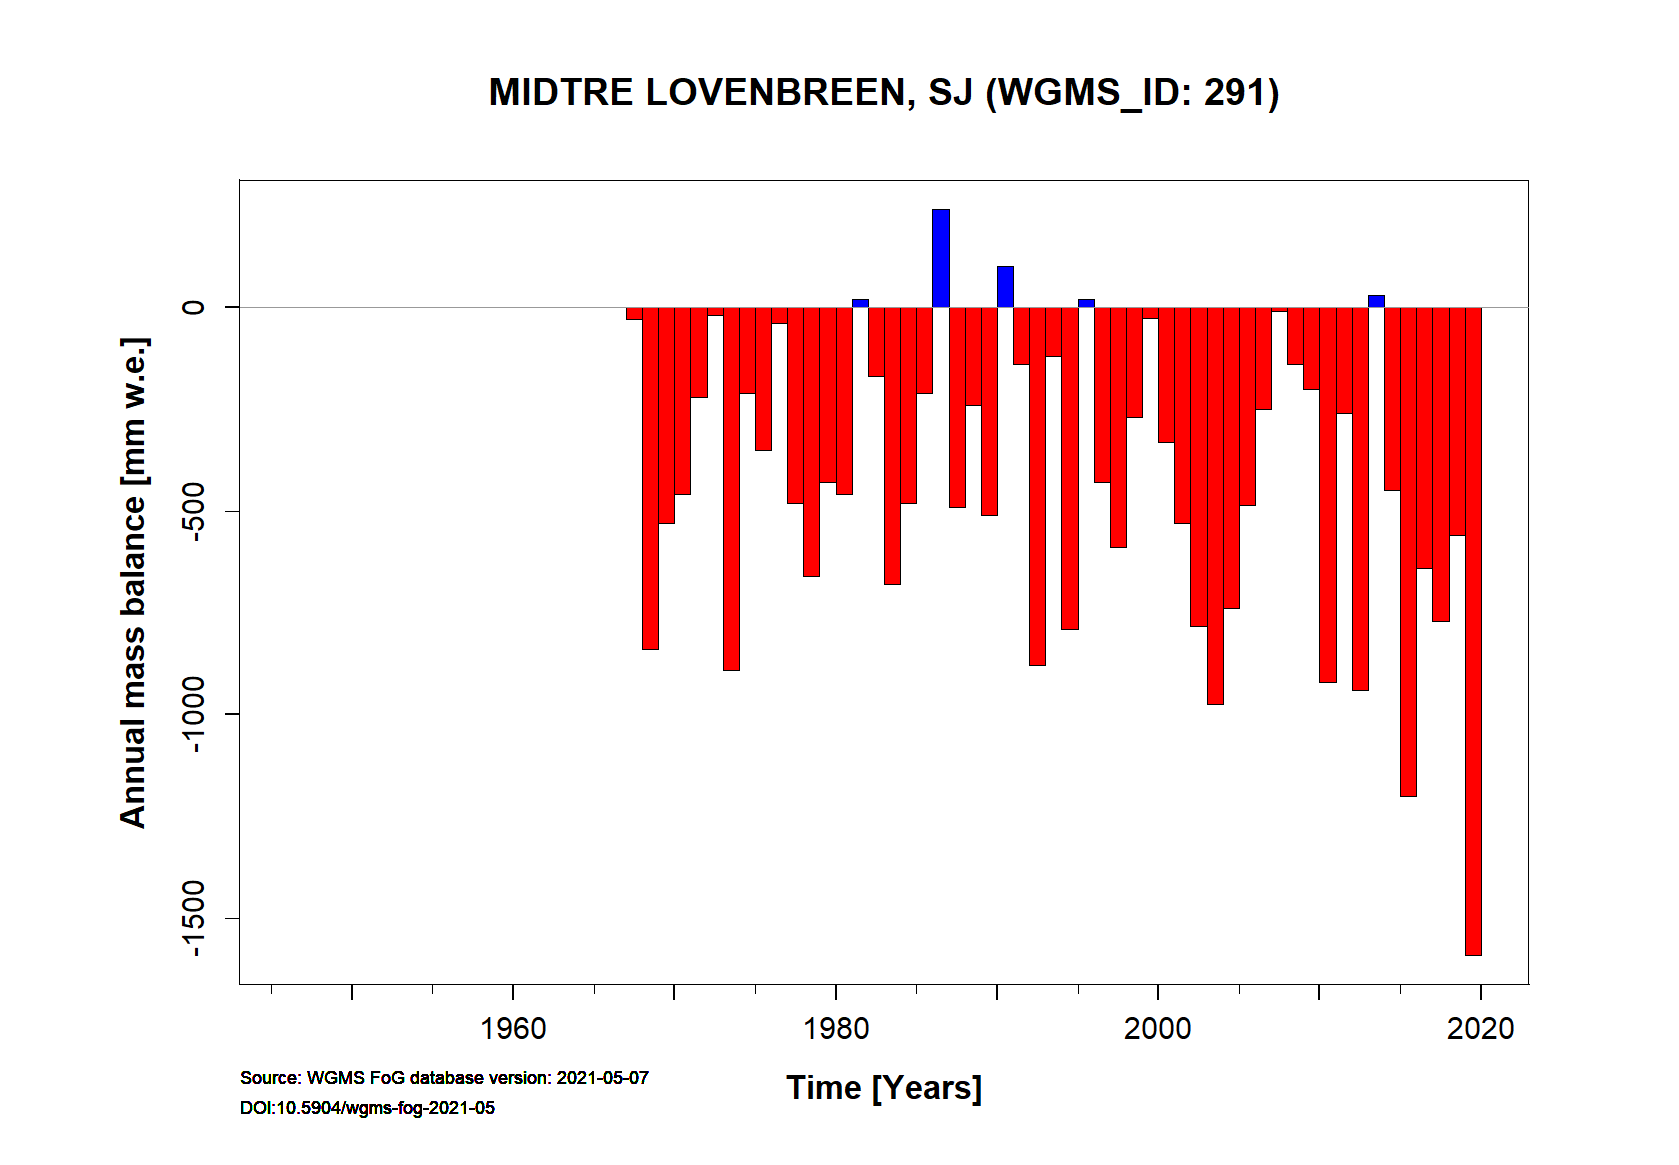 Midtre Lovénbreen Annual Mass Balance (WGMS, 2016)